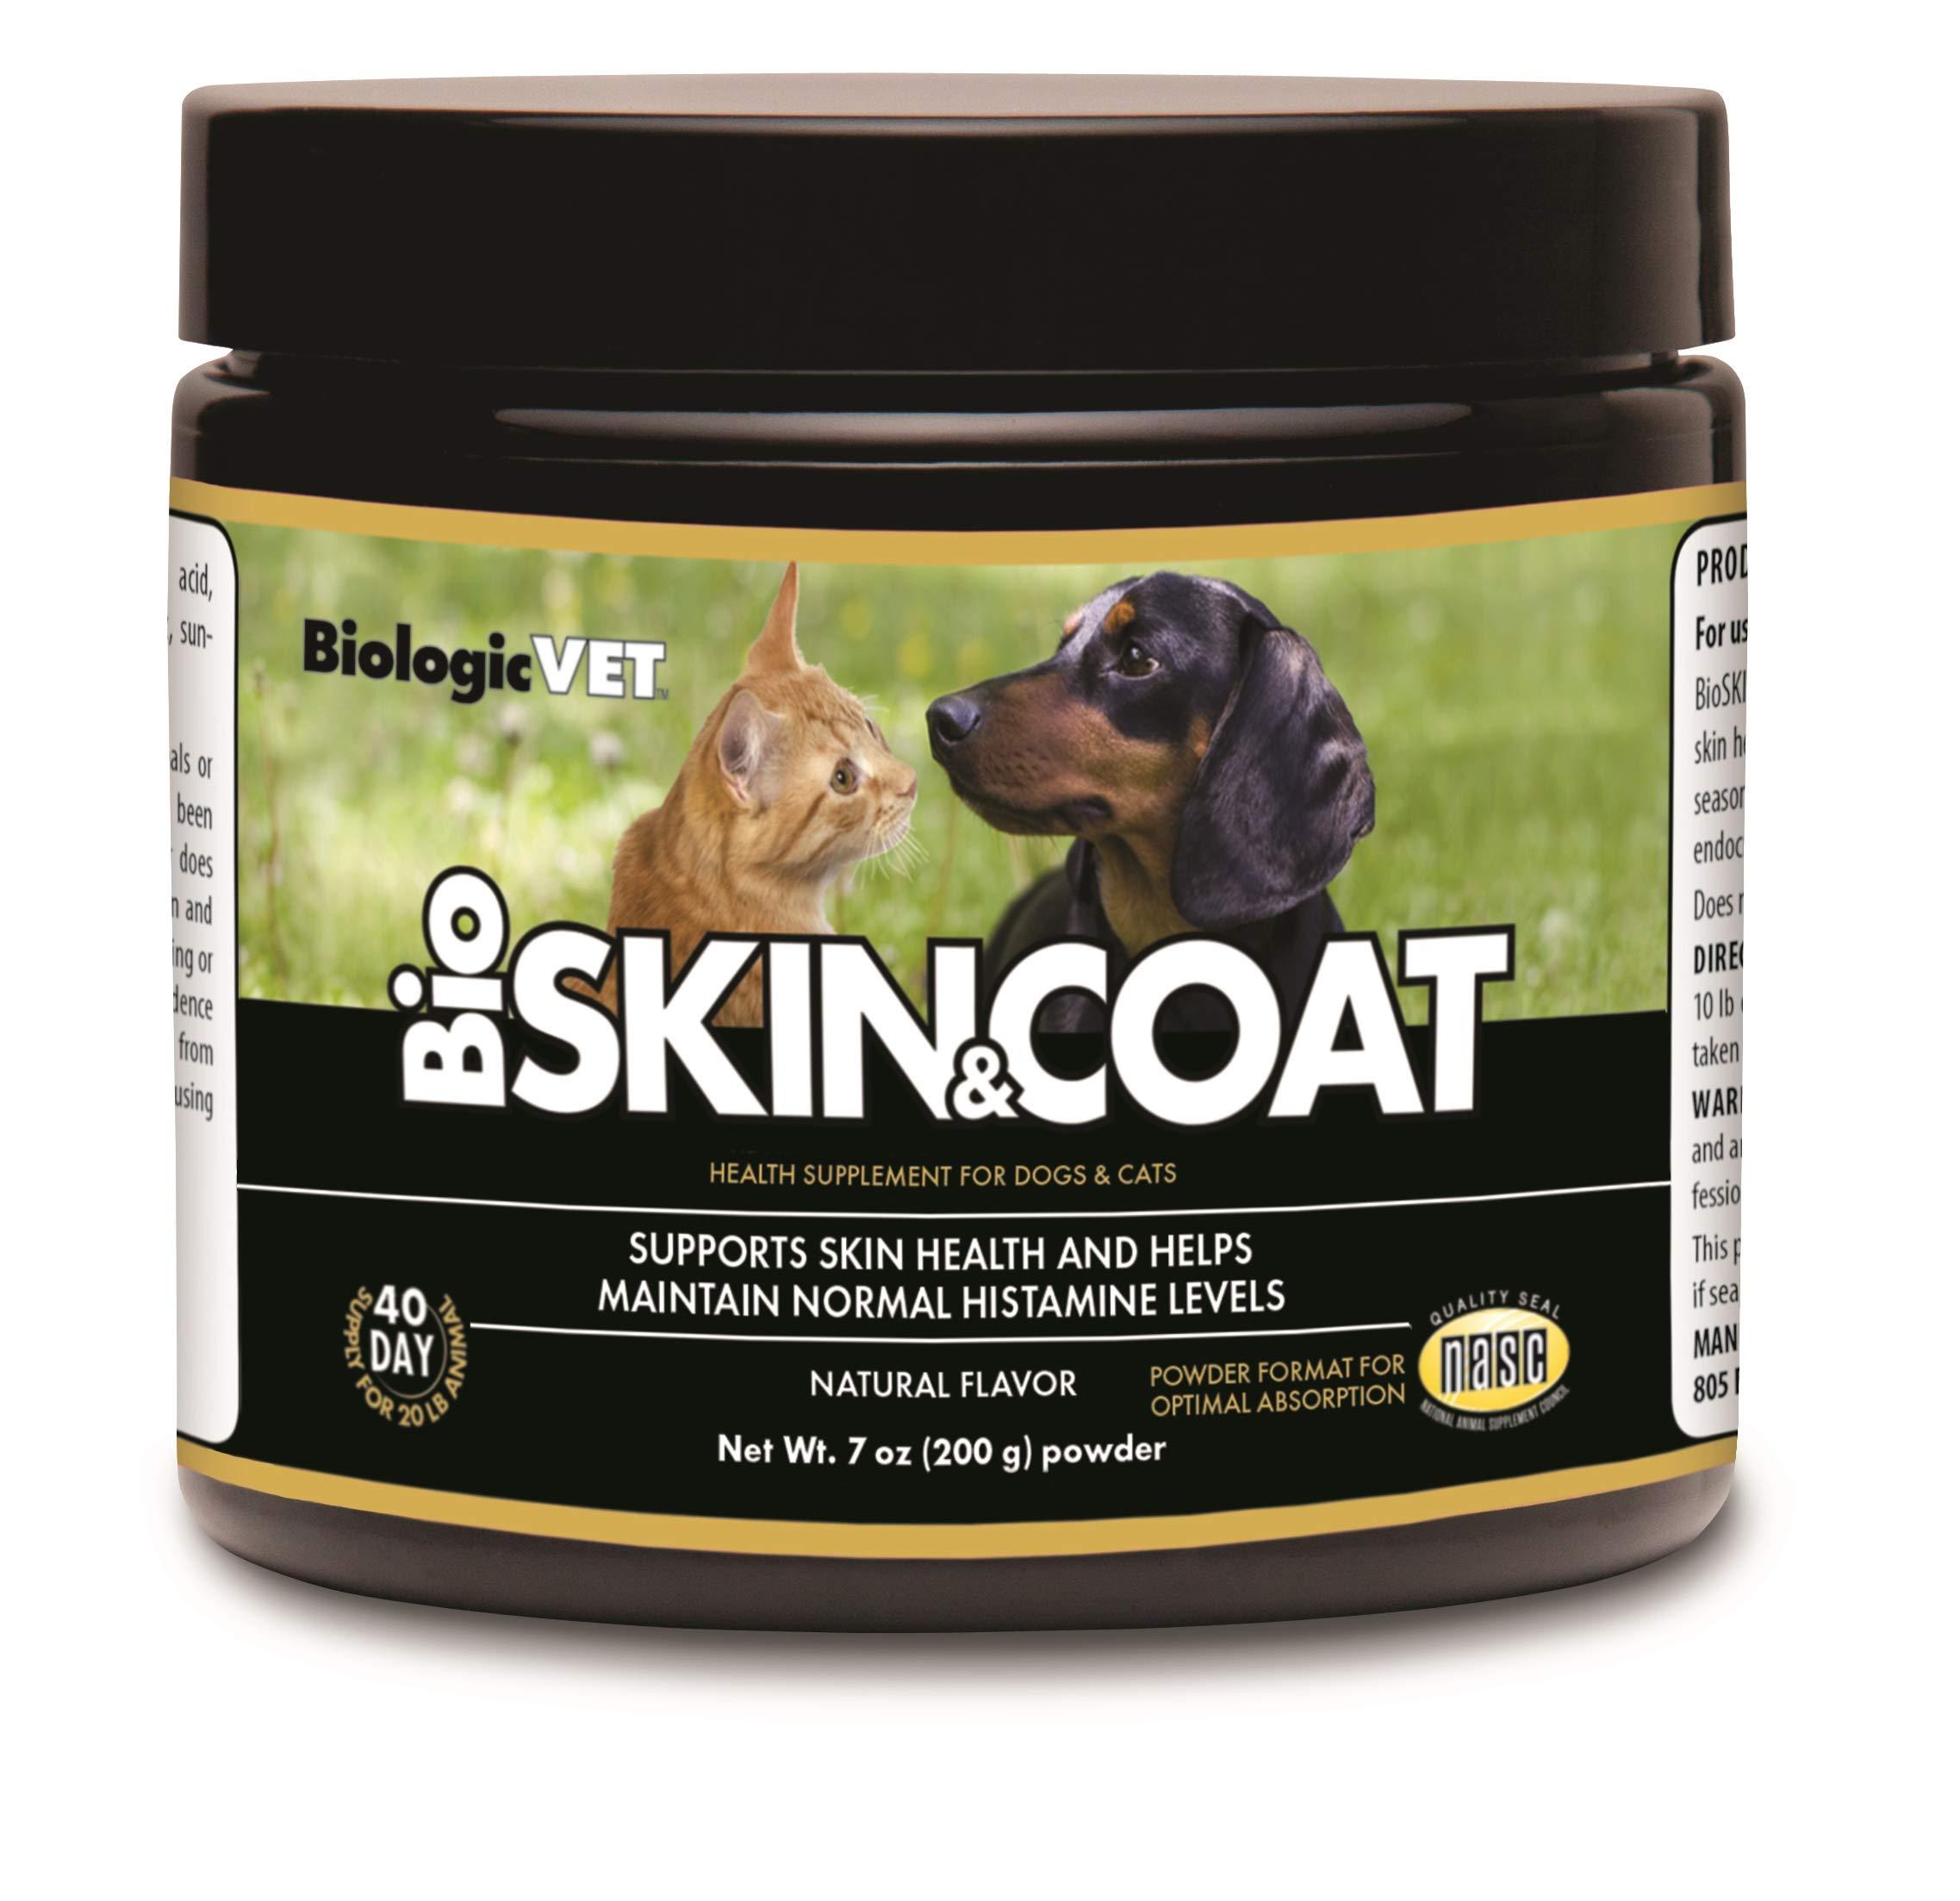 BiologicVET Bioskin&Coat Natural Antihistamine for Dogs & Cats, Powder 7 oz. by BiologicVET